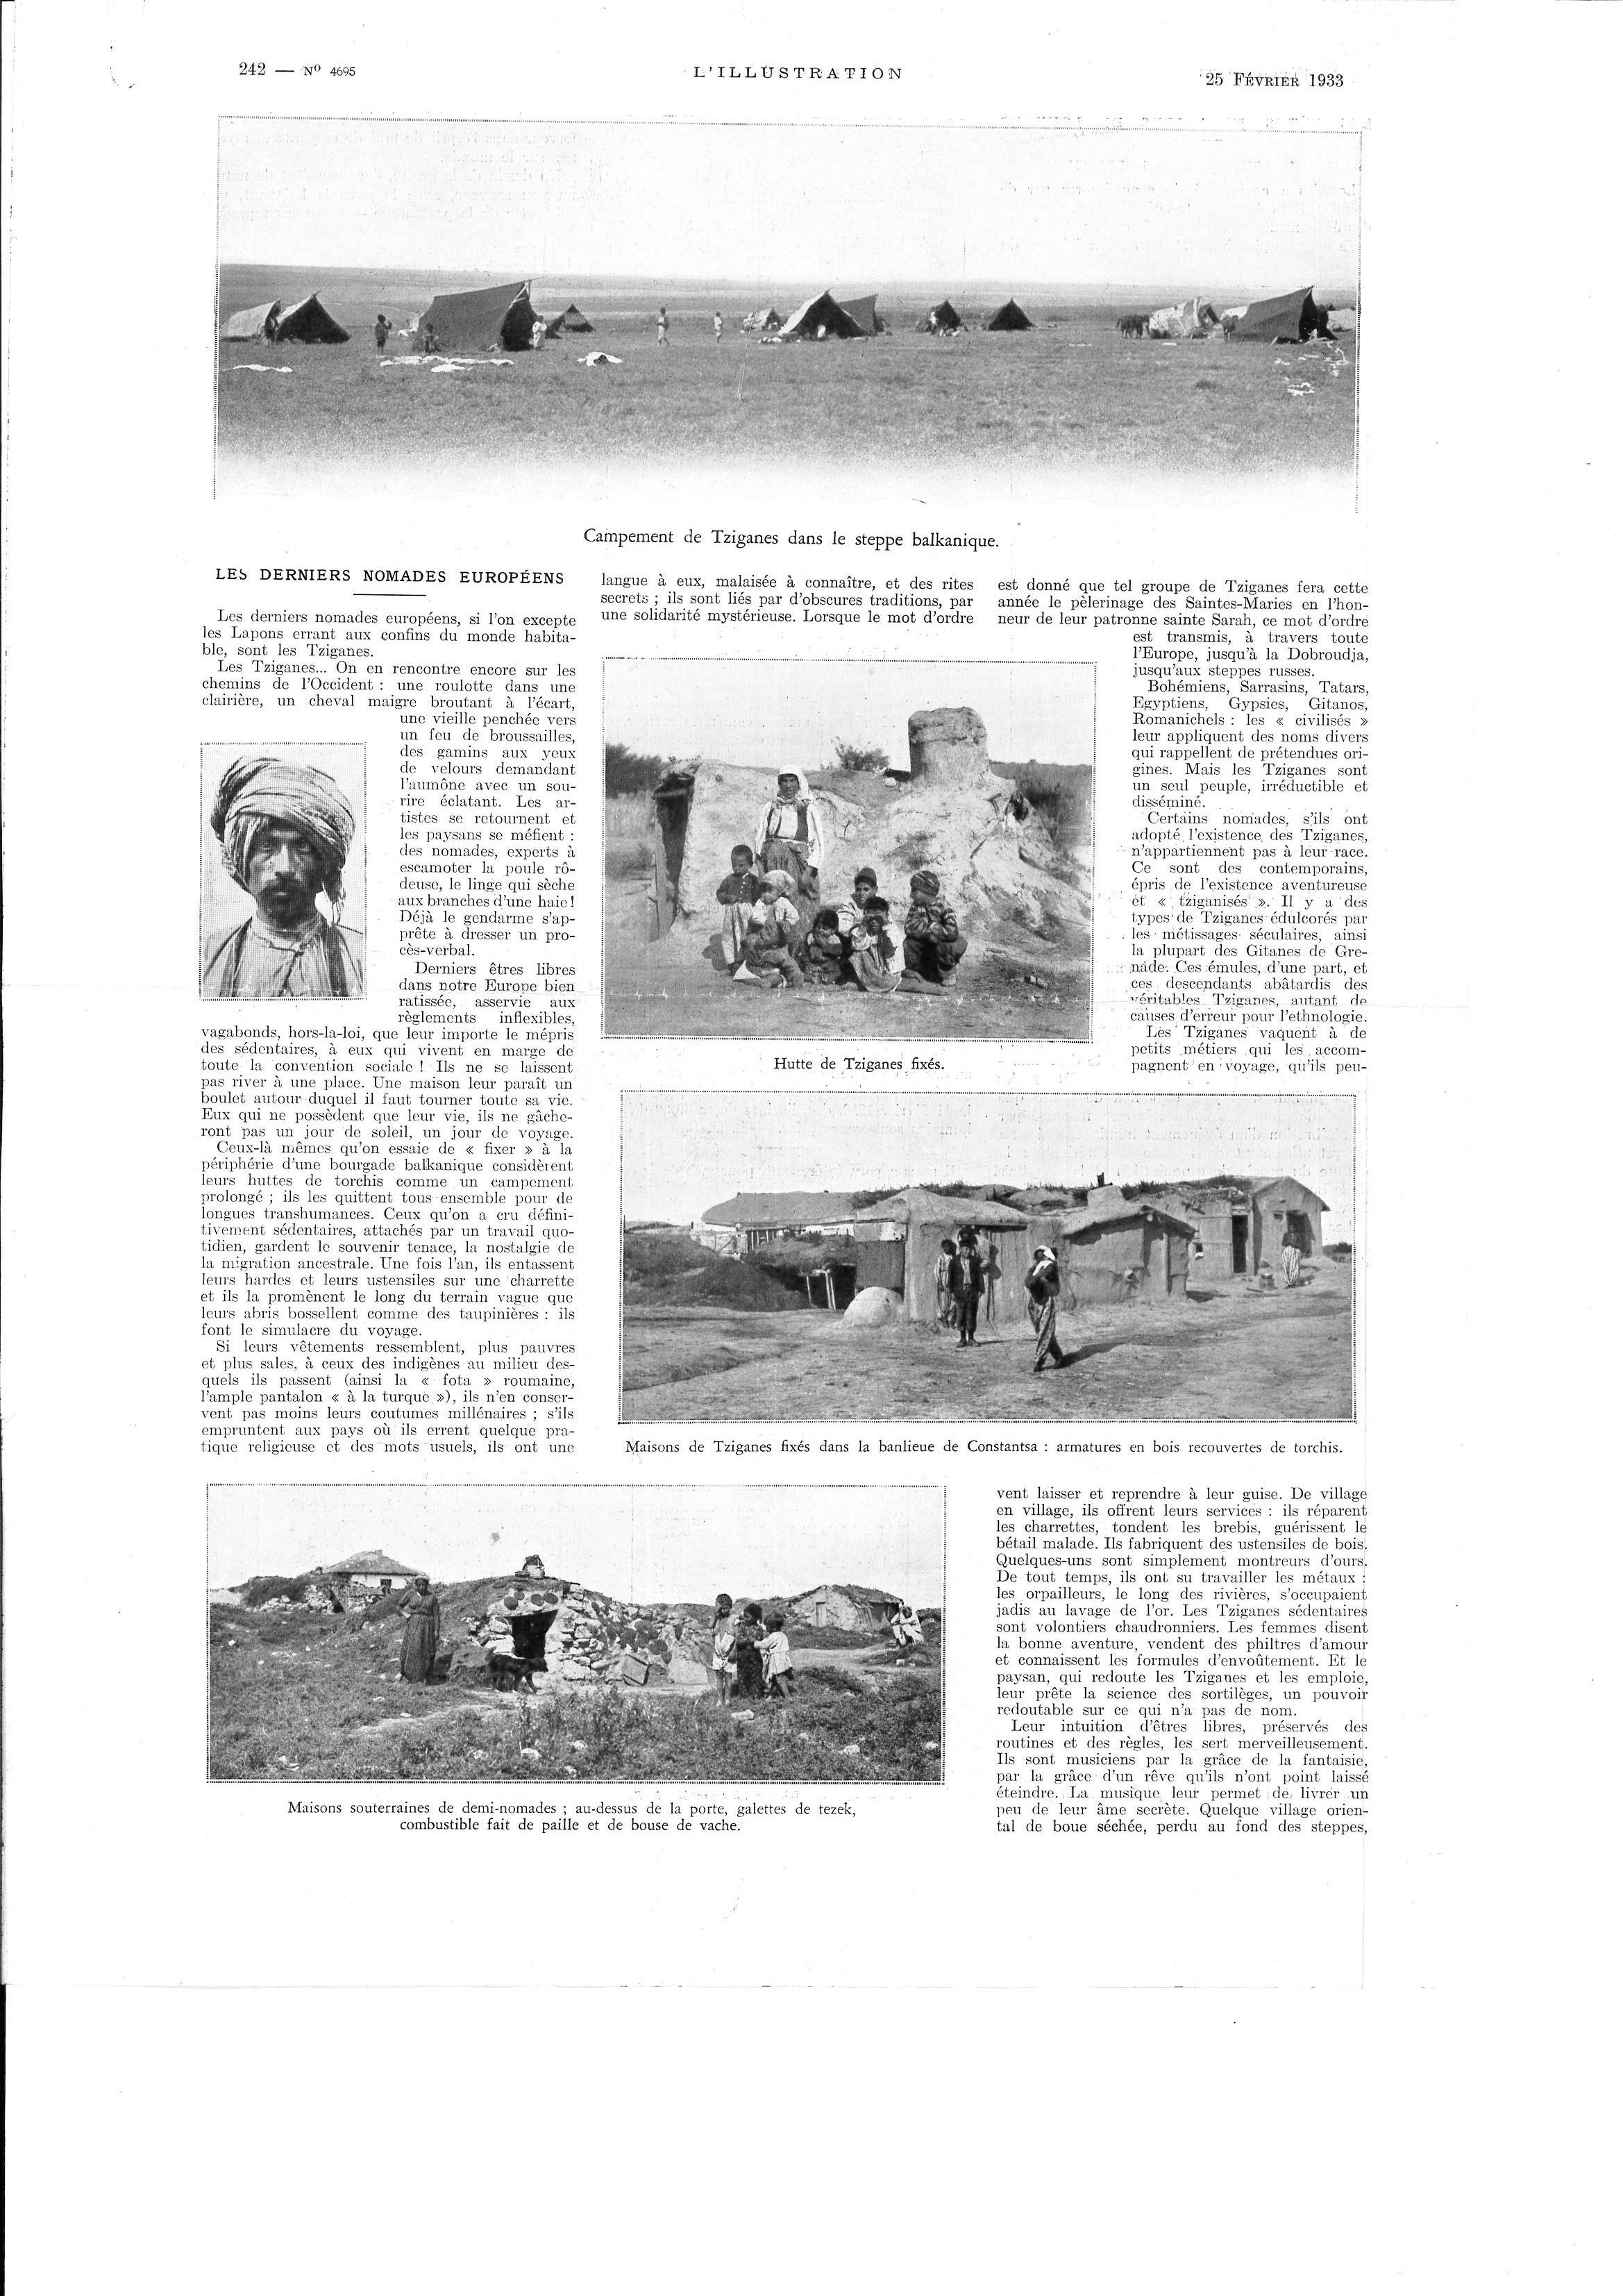 p.242.jpg - image/jpeg